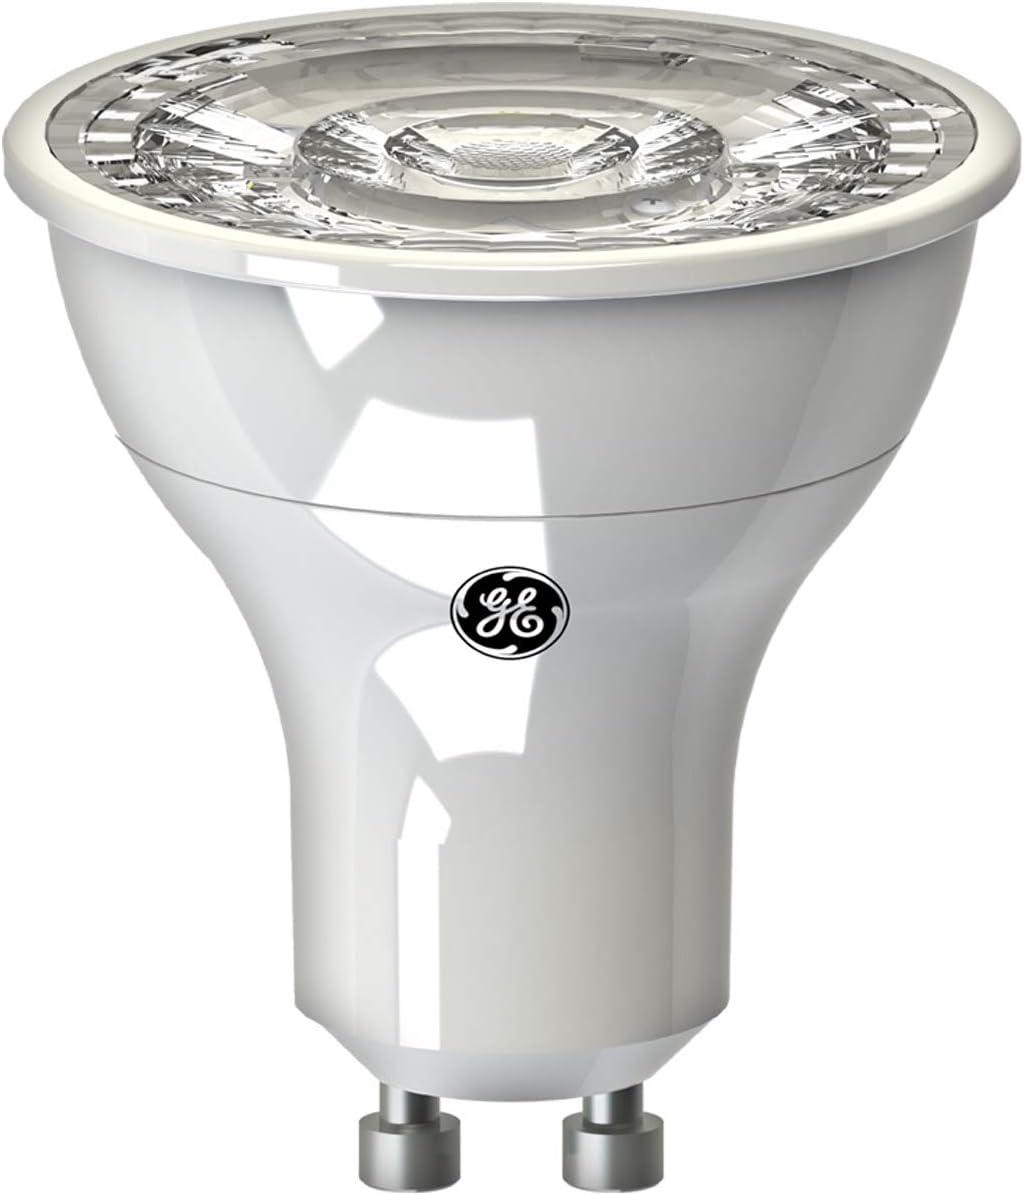 GE Lighting 92291 LED 3.5-watt (35-watt Replacement), 200-lumen GU10 Light Bulb, Reveal, 1-Pack